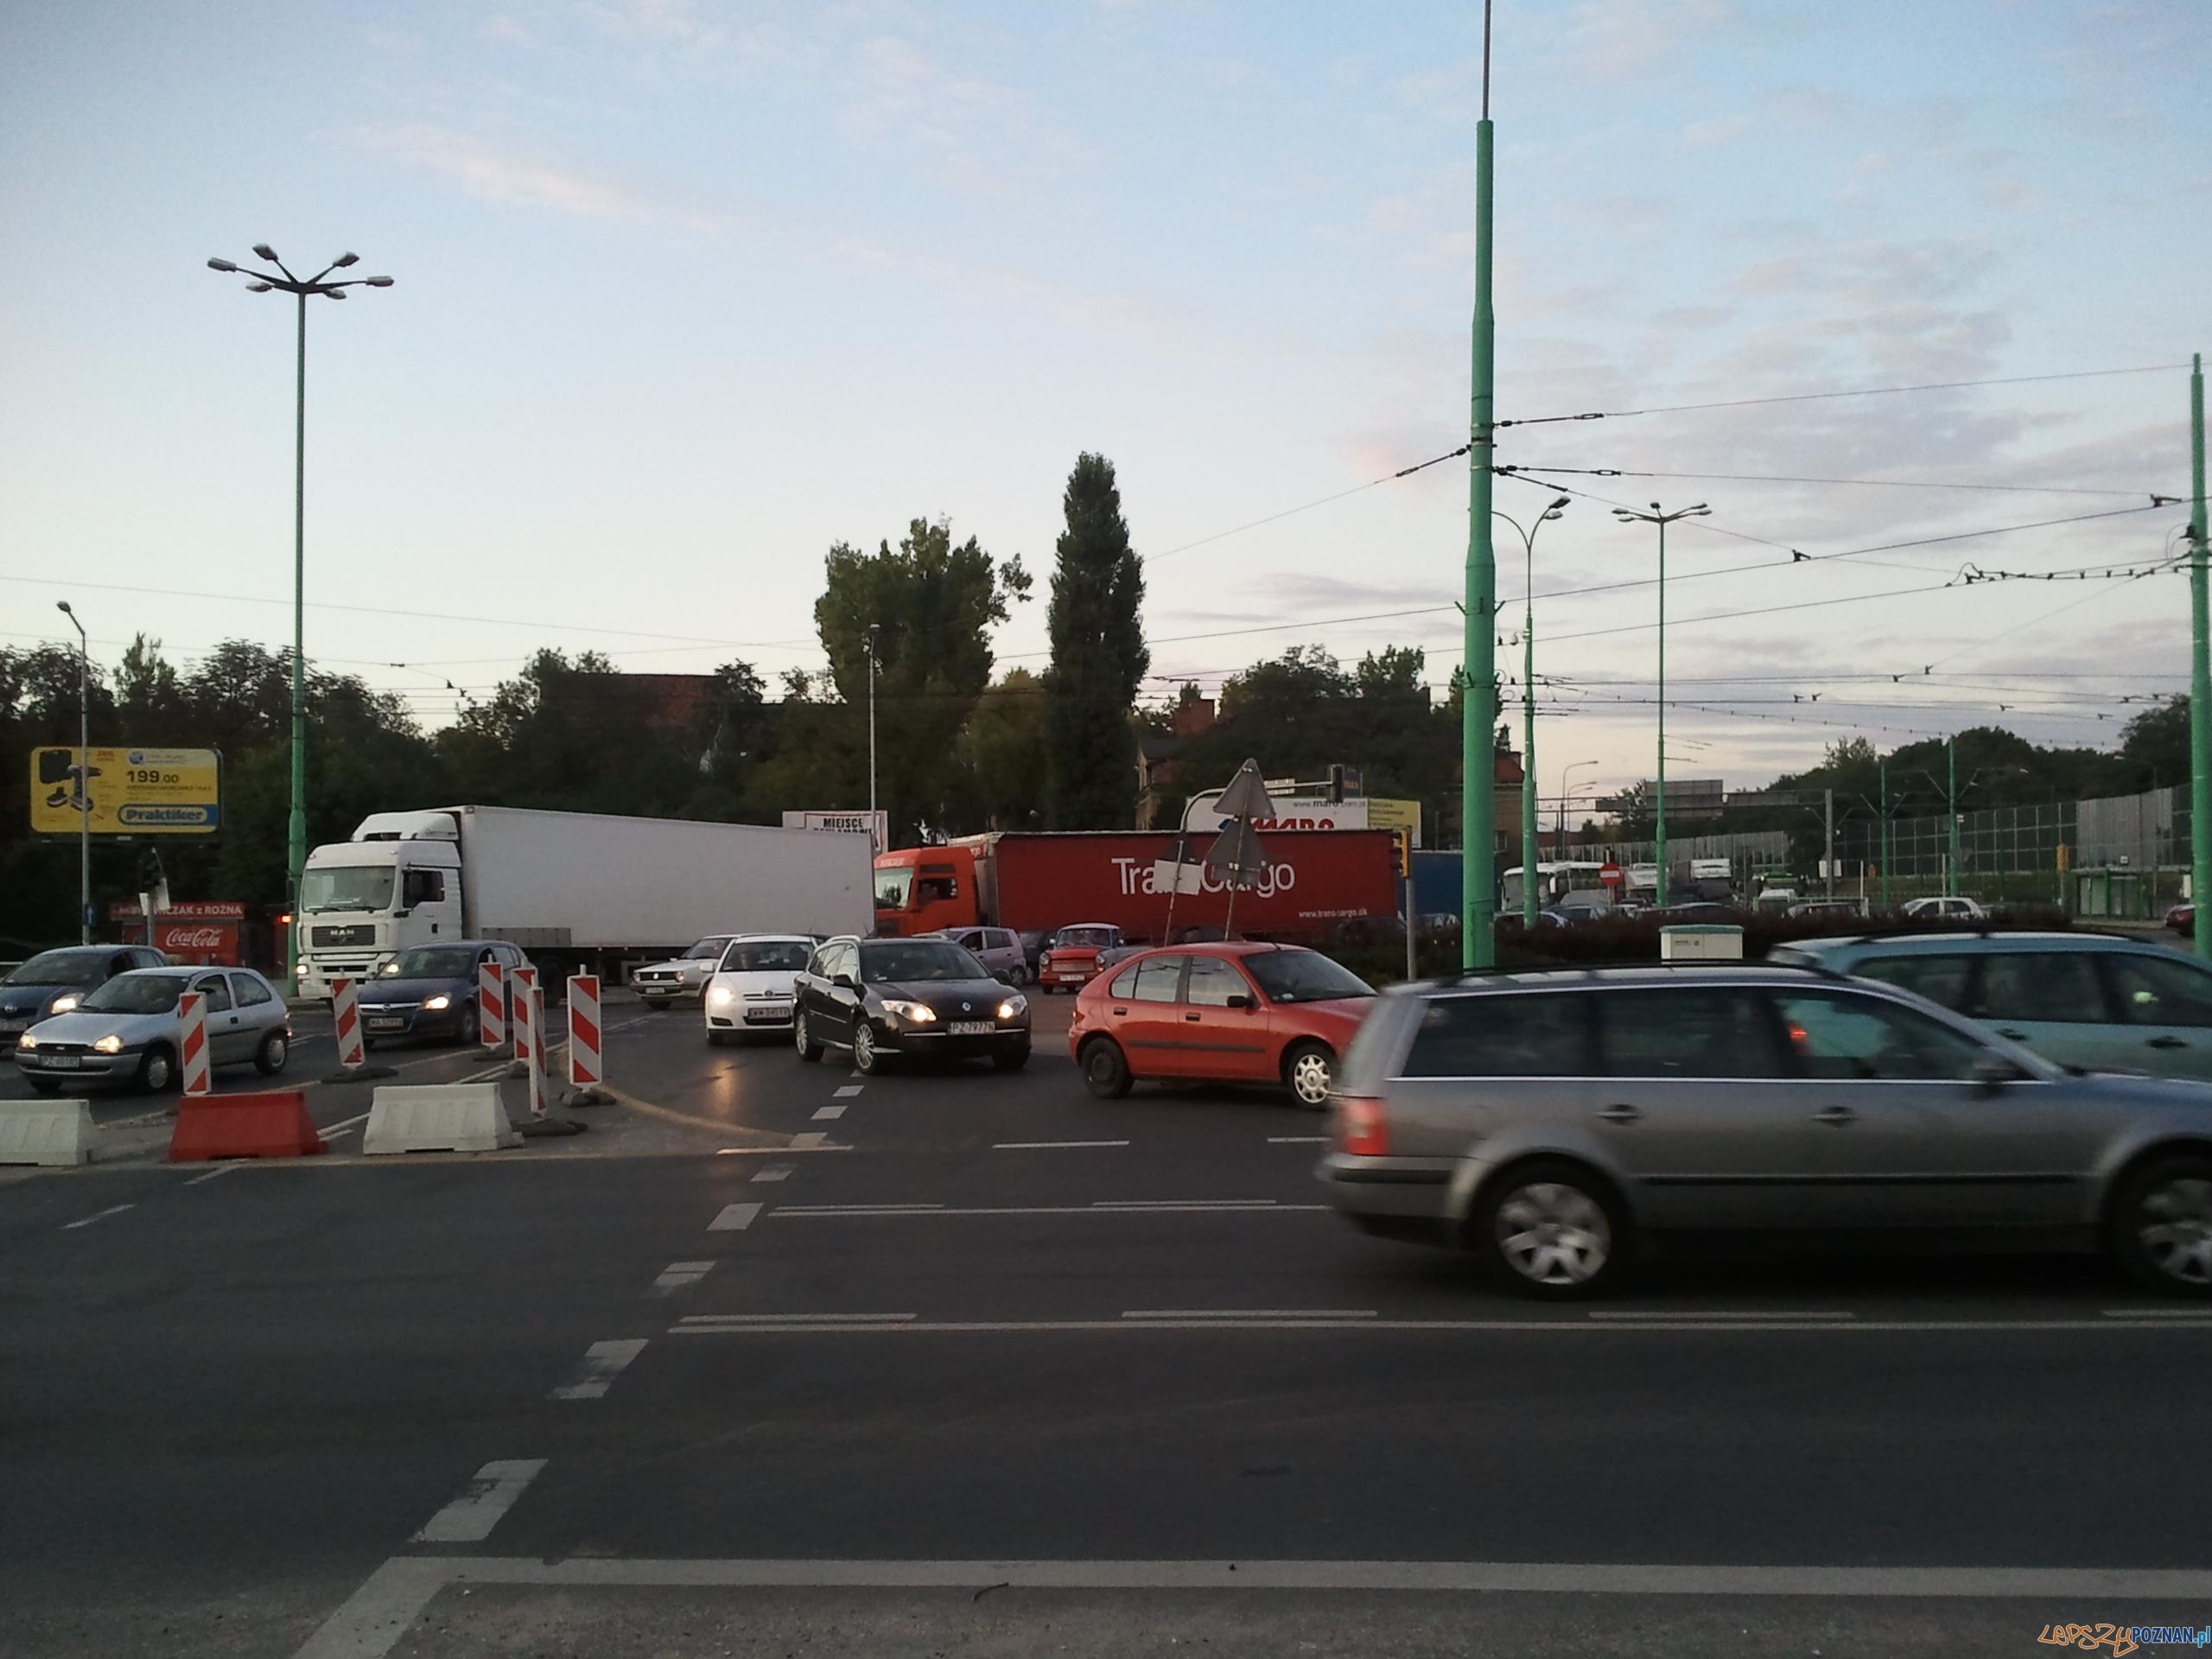 Korek gigant - rondo Śródka  Foto: LepszyPOZNAN.pl/gsm